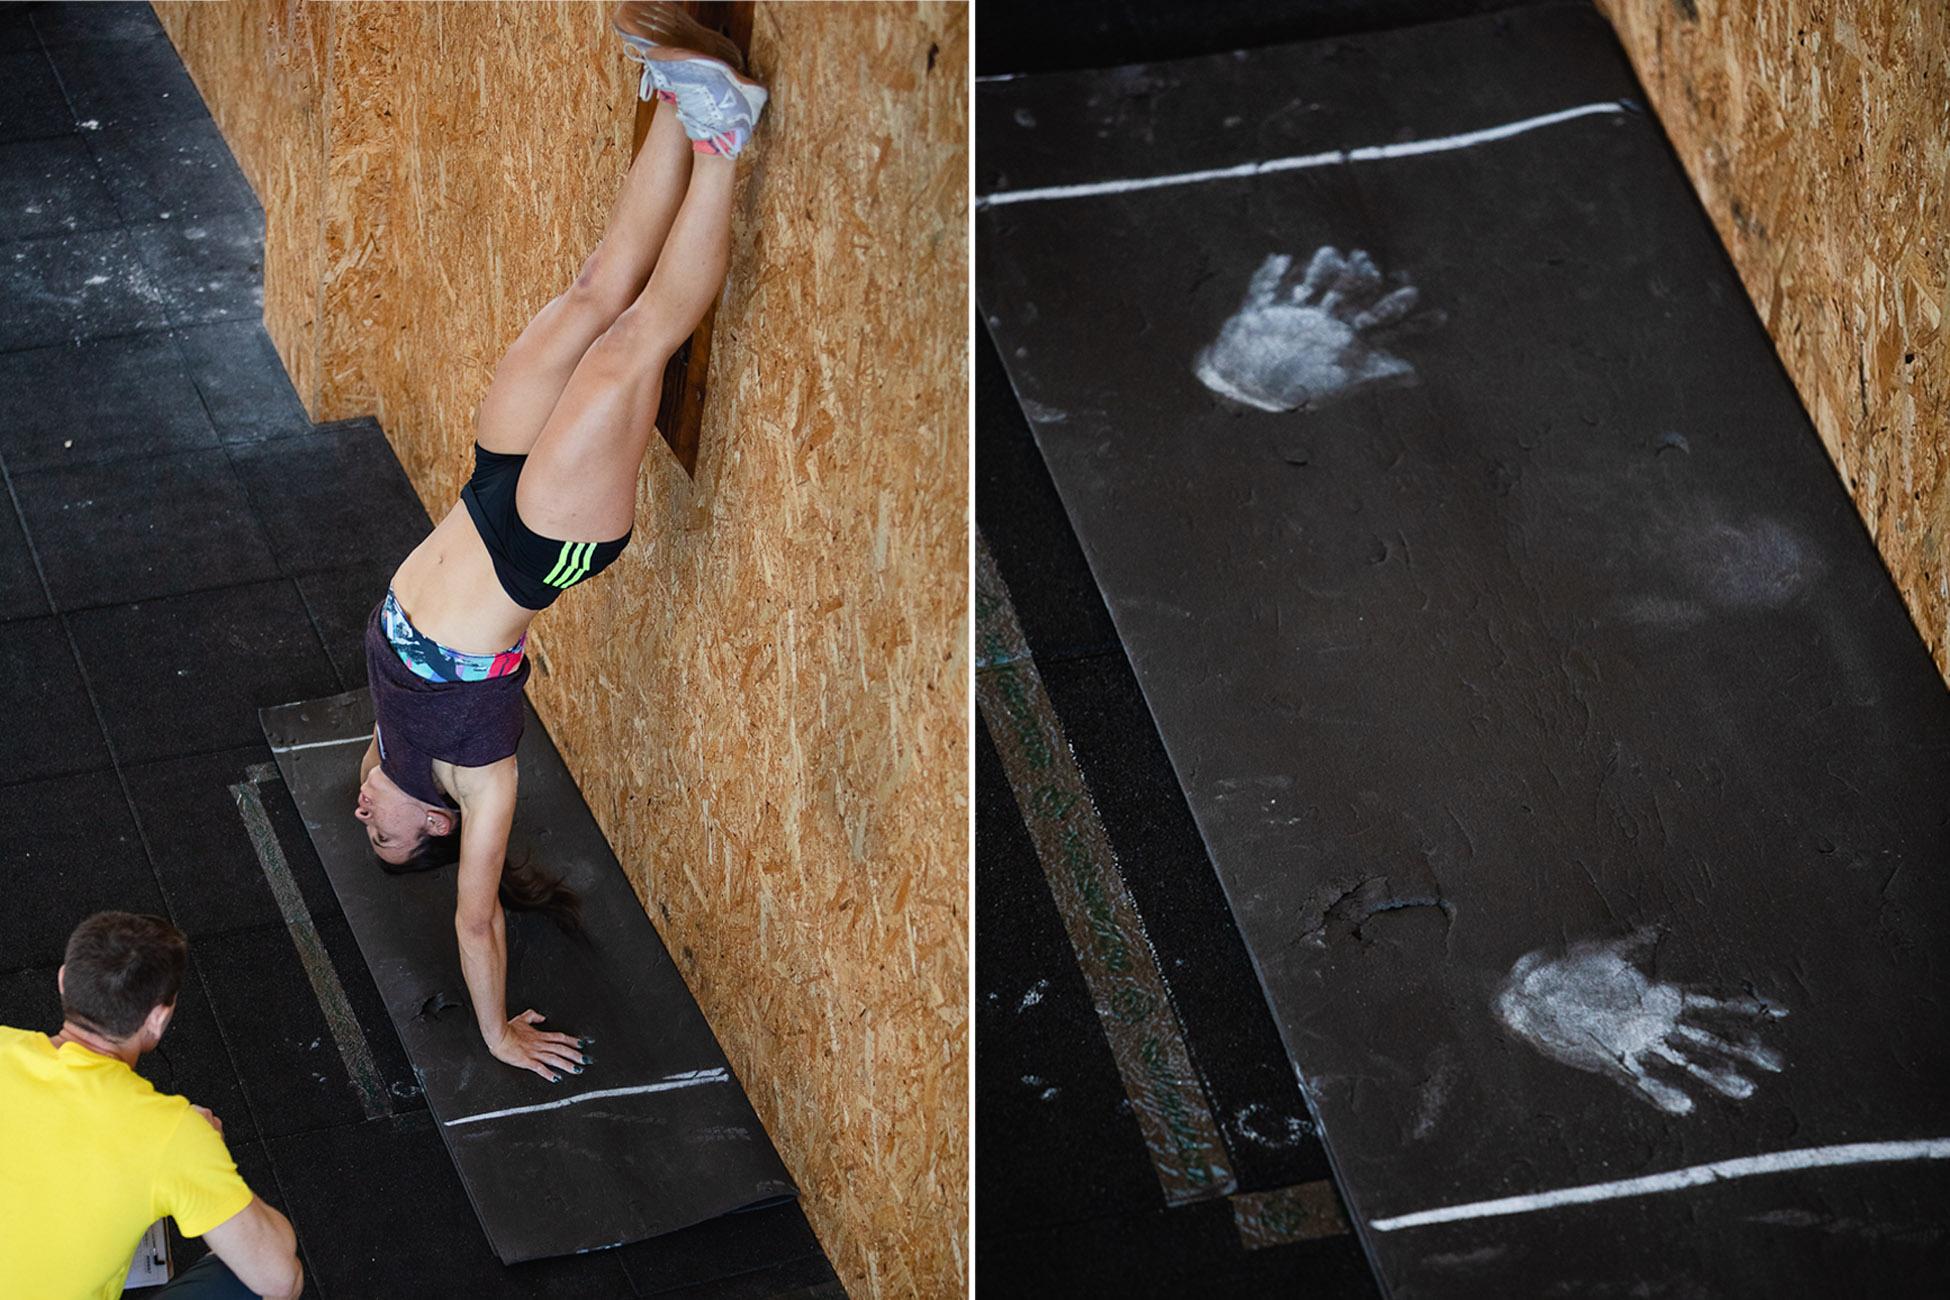 crossfit-games-open-fitness-lifestyle-desporto-atleta-fotografia-006.jpg